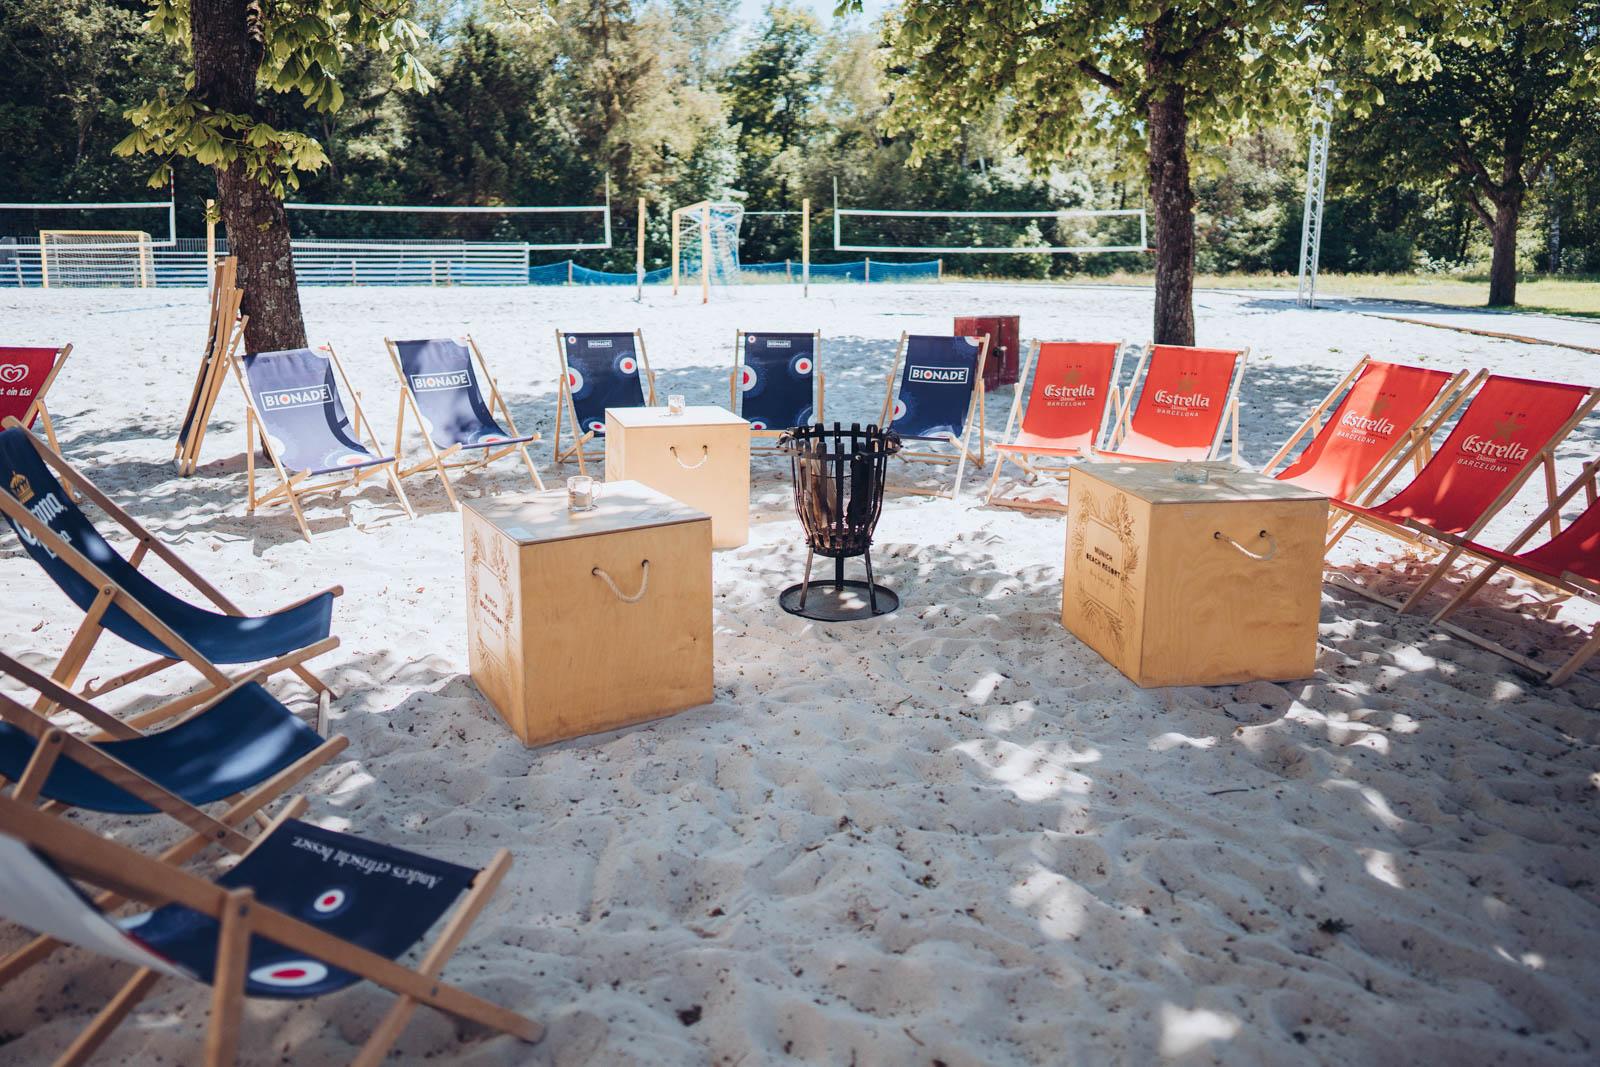 hochzeitsfotograf-munich-beach-resort-gavesi-catering-mokati-fotos-film-062019-39